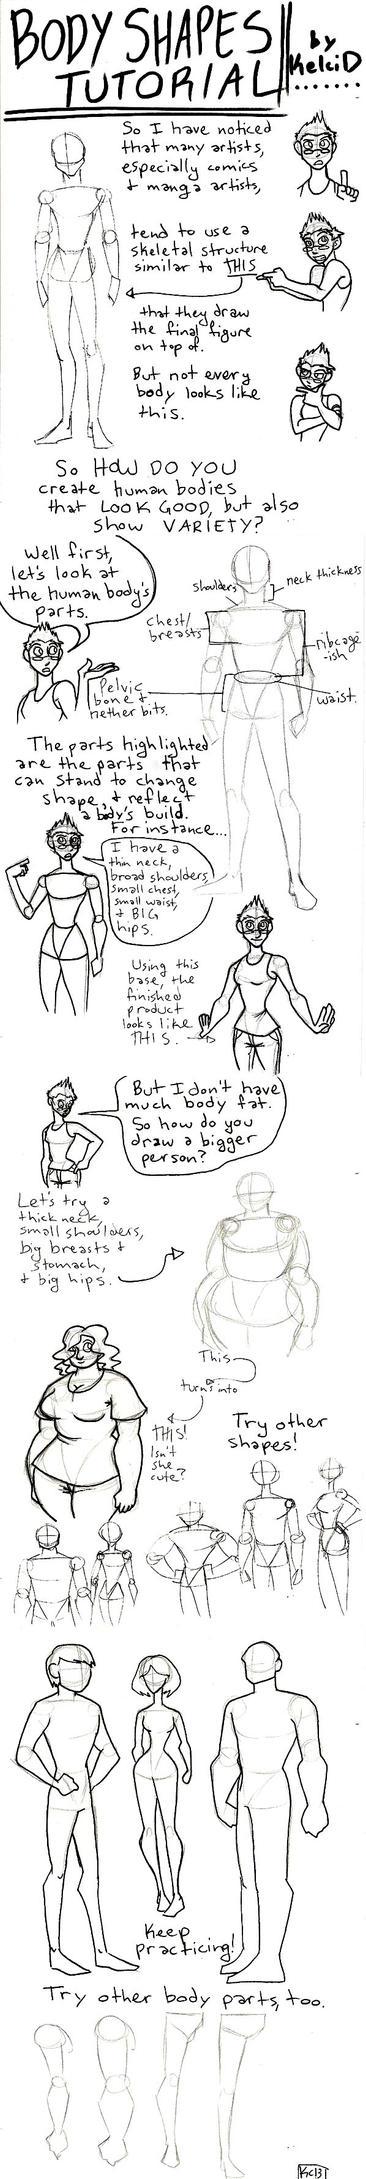 Body Shapes Tutorial by KelciD